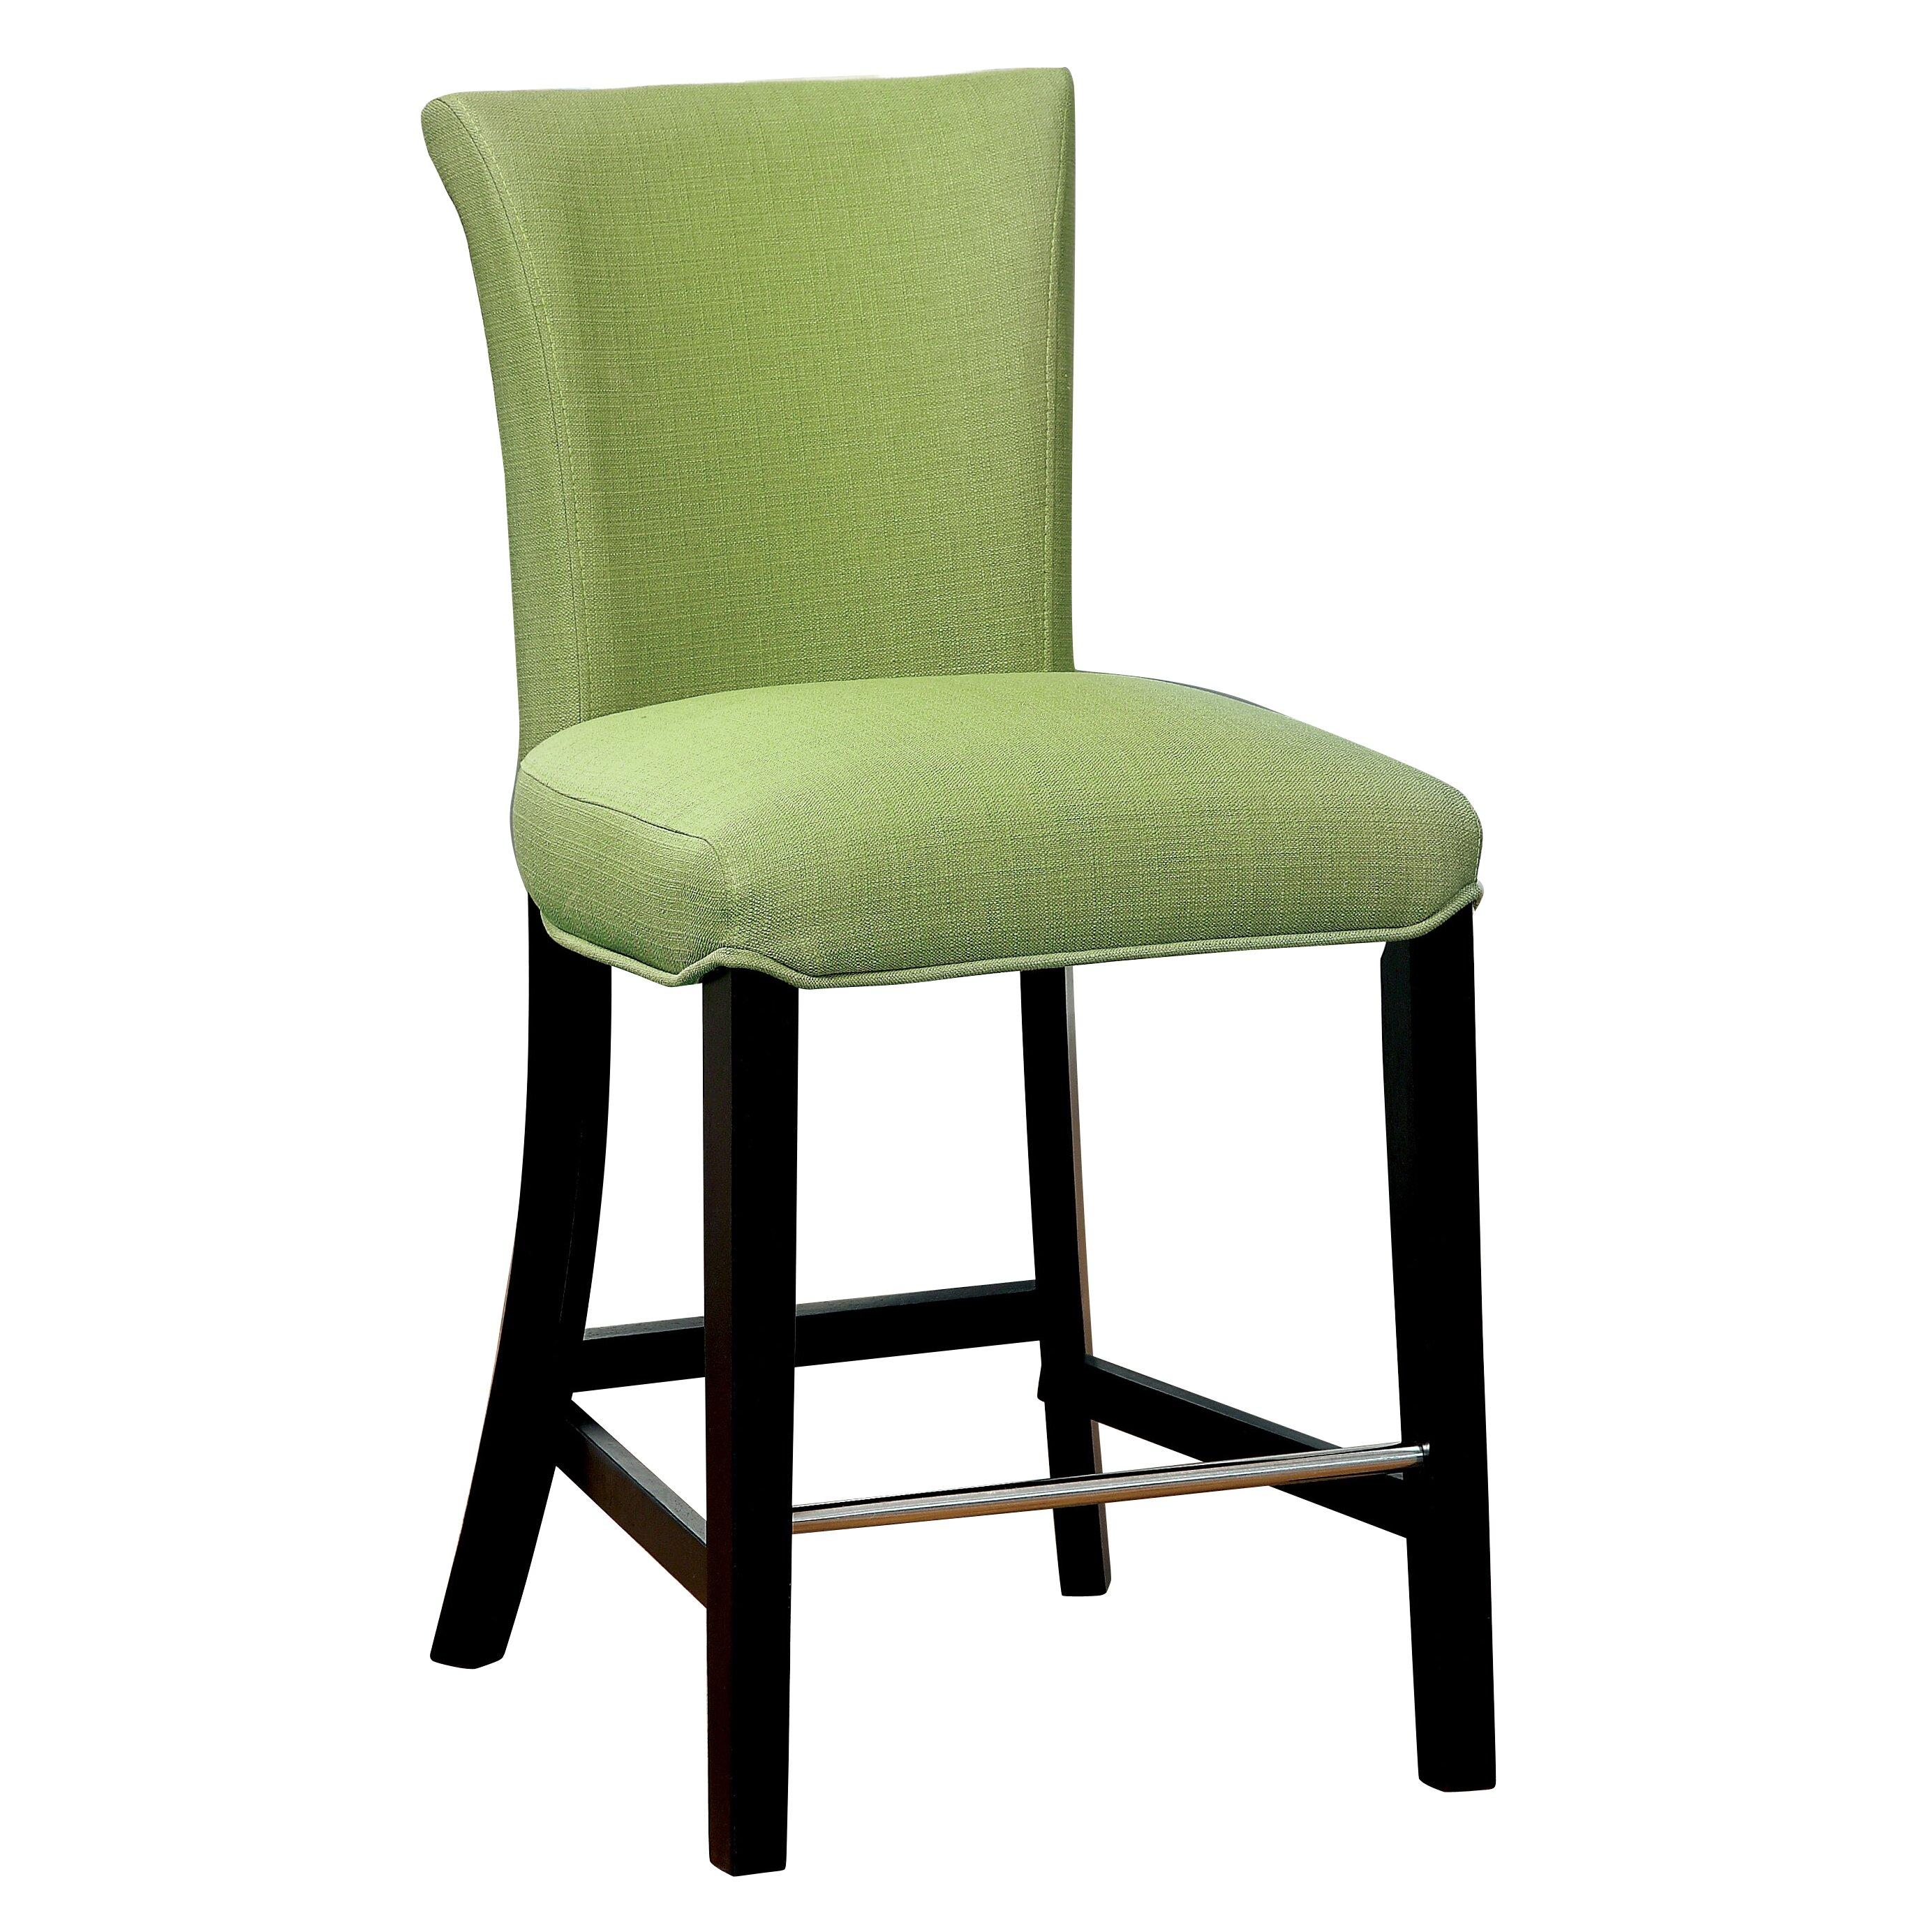 Hokku Designs Marsella 41quot Bar Stool with Cushion  : Marsella2B262525222BBar2BStool from www.wayfair.com size 2768 x 2768 jpeg 891kB